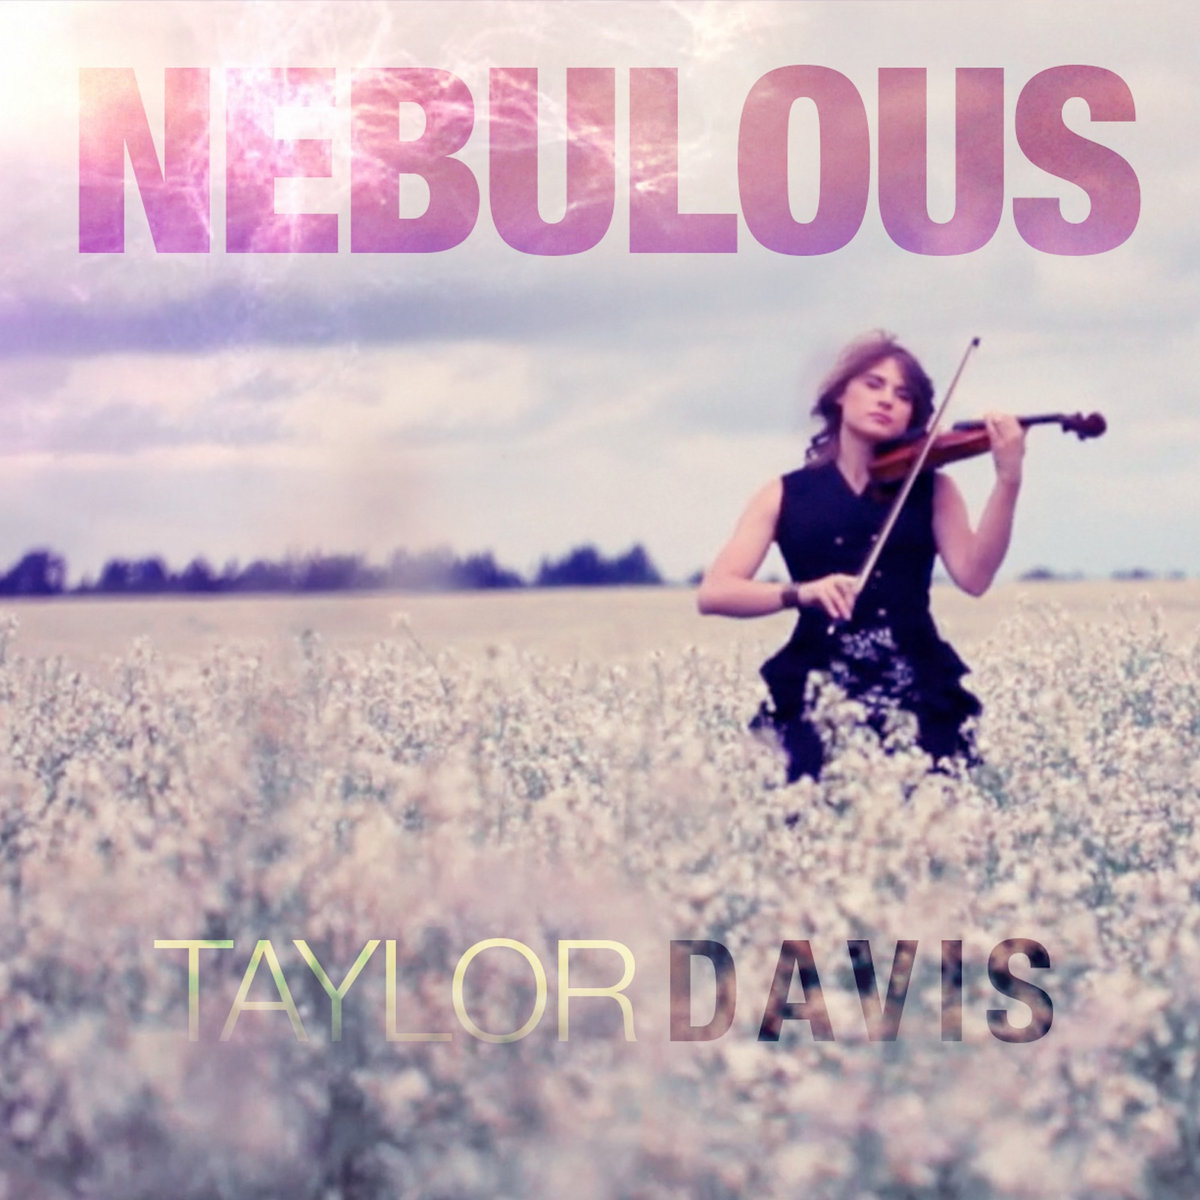 Taylor davis sadness and sorrow youtube.